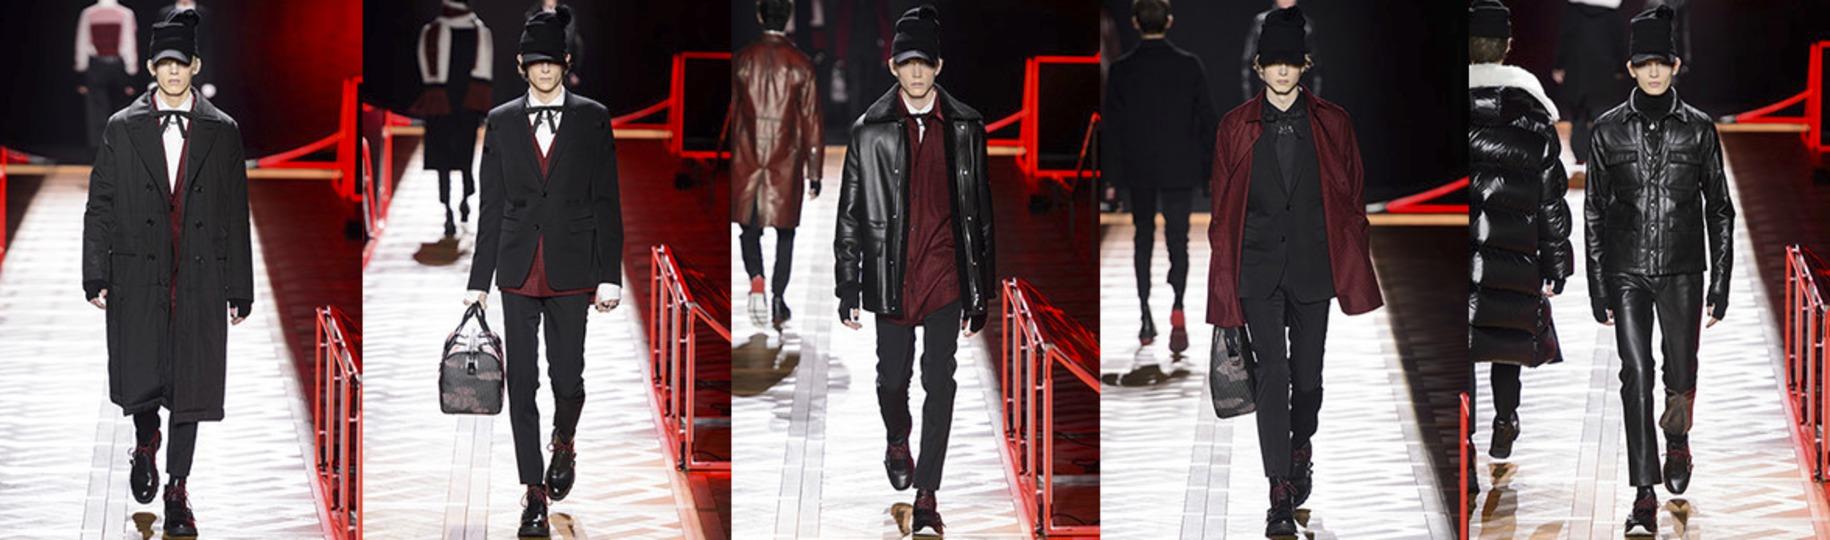 Dior Homme (Image 6)